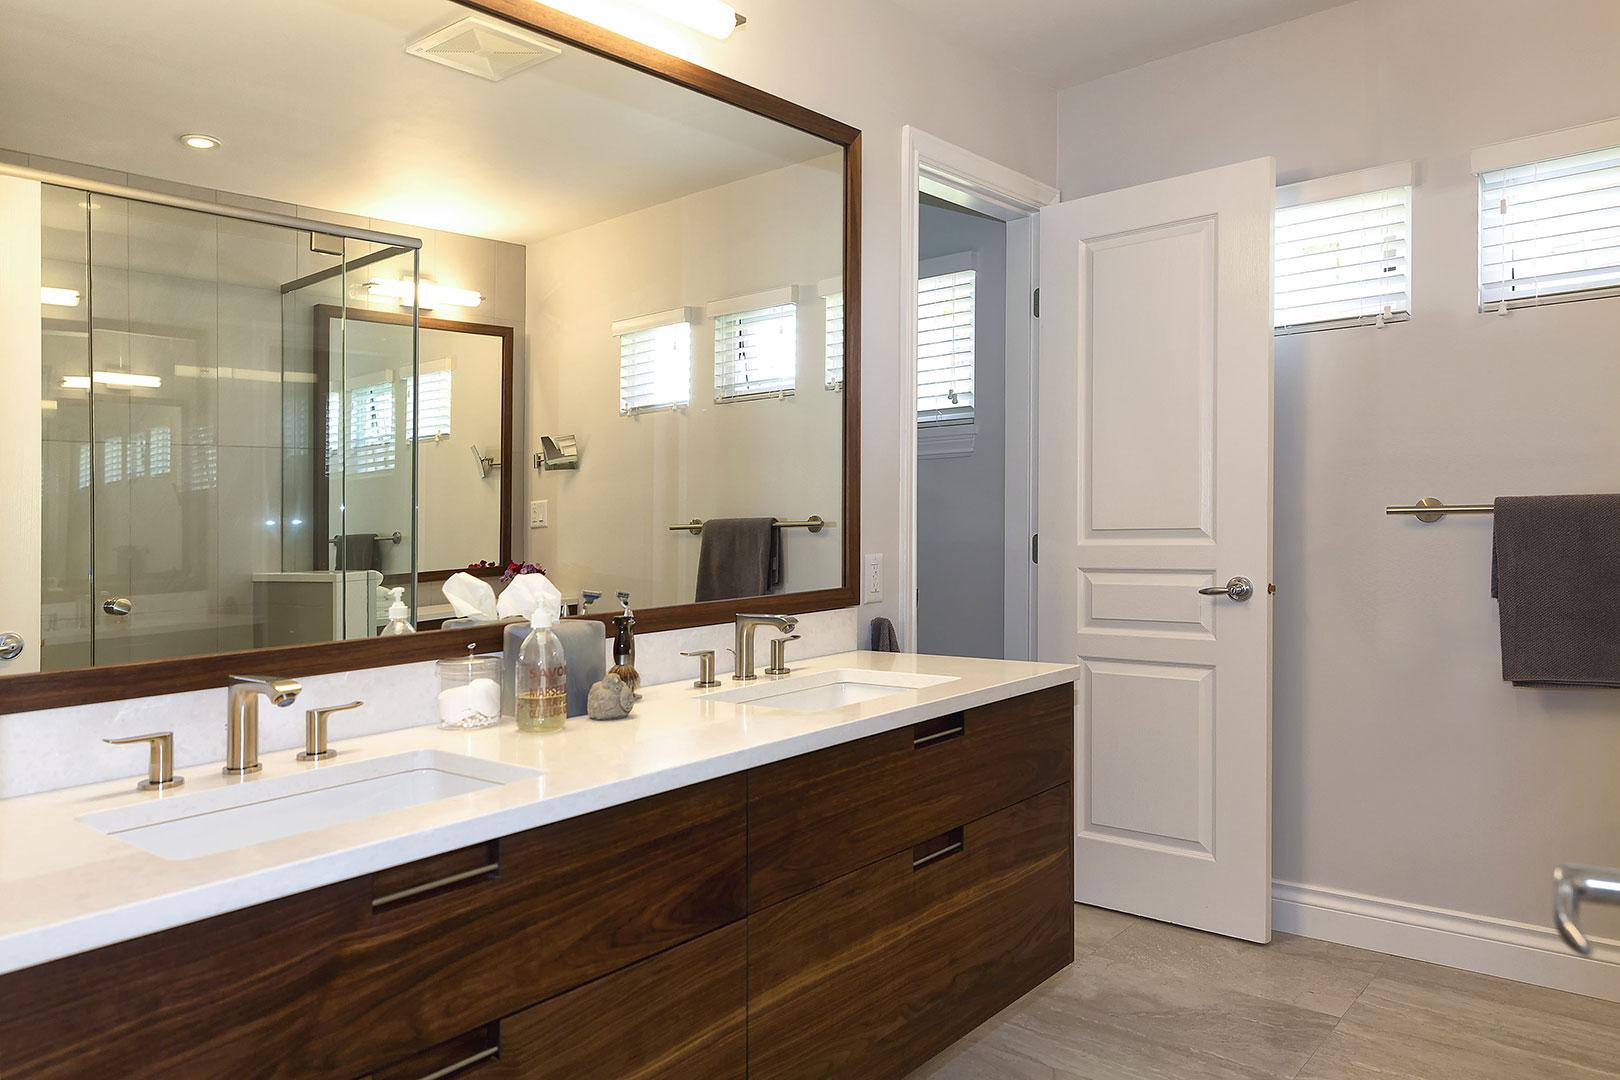 Vancouver bathroom vanity